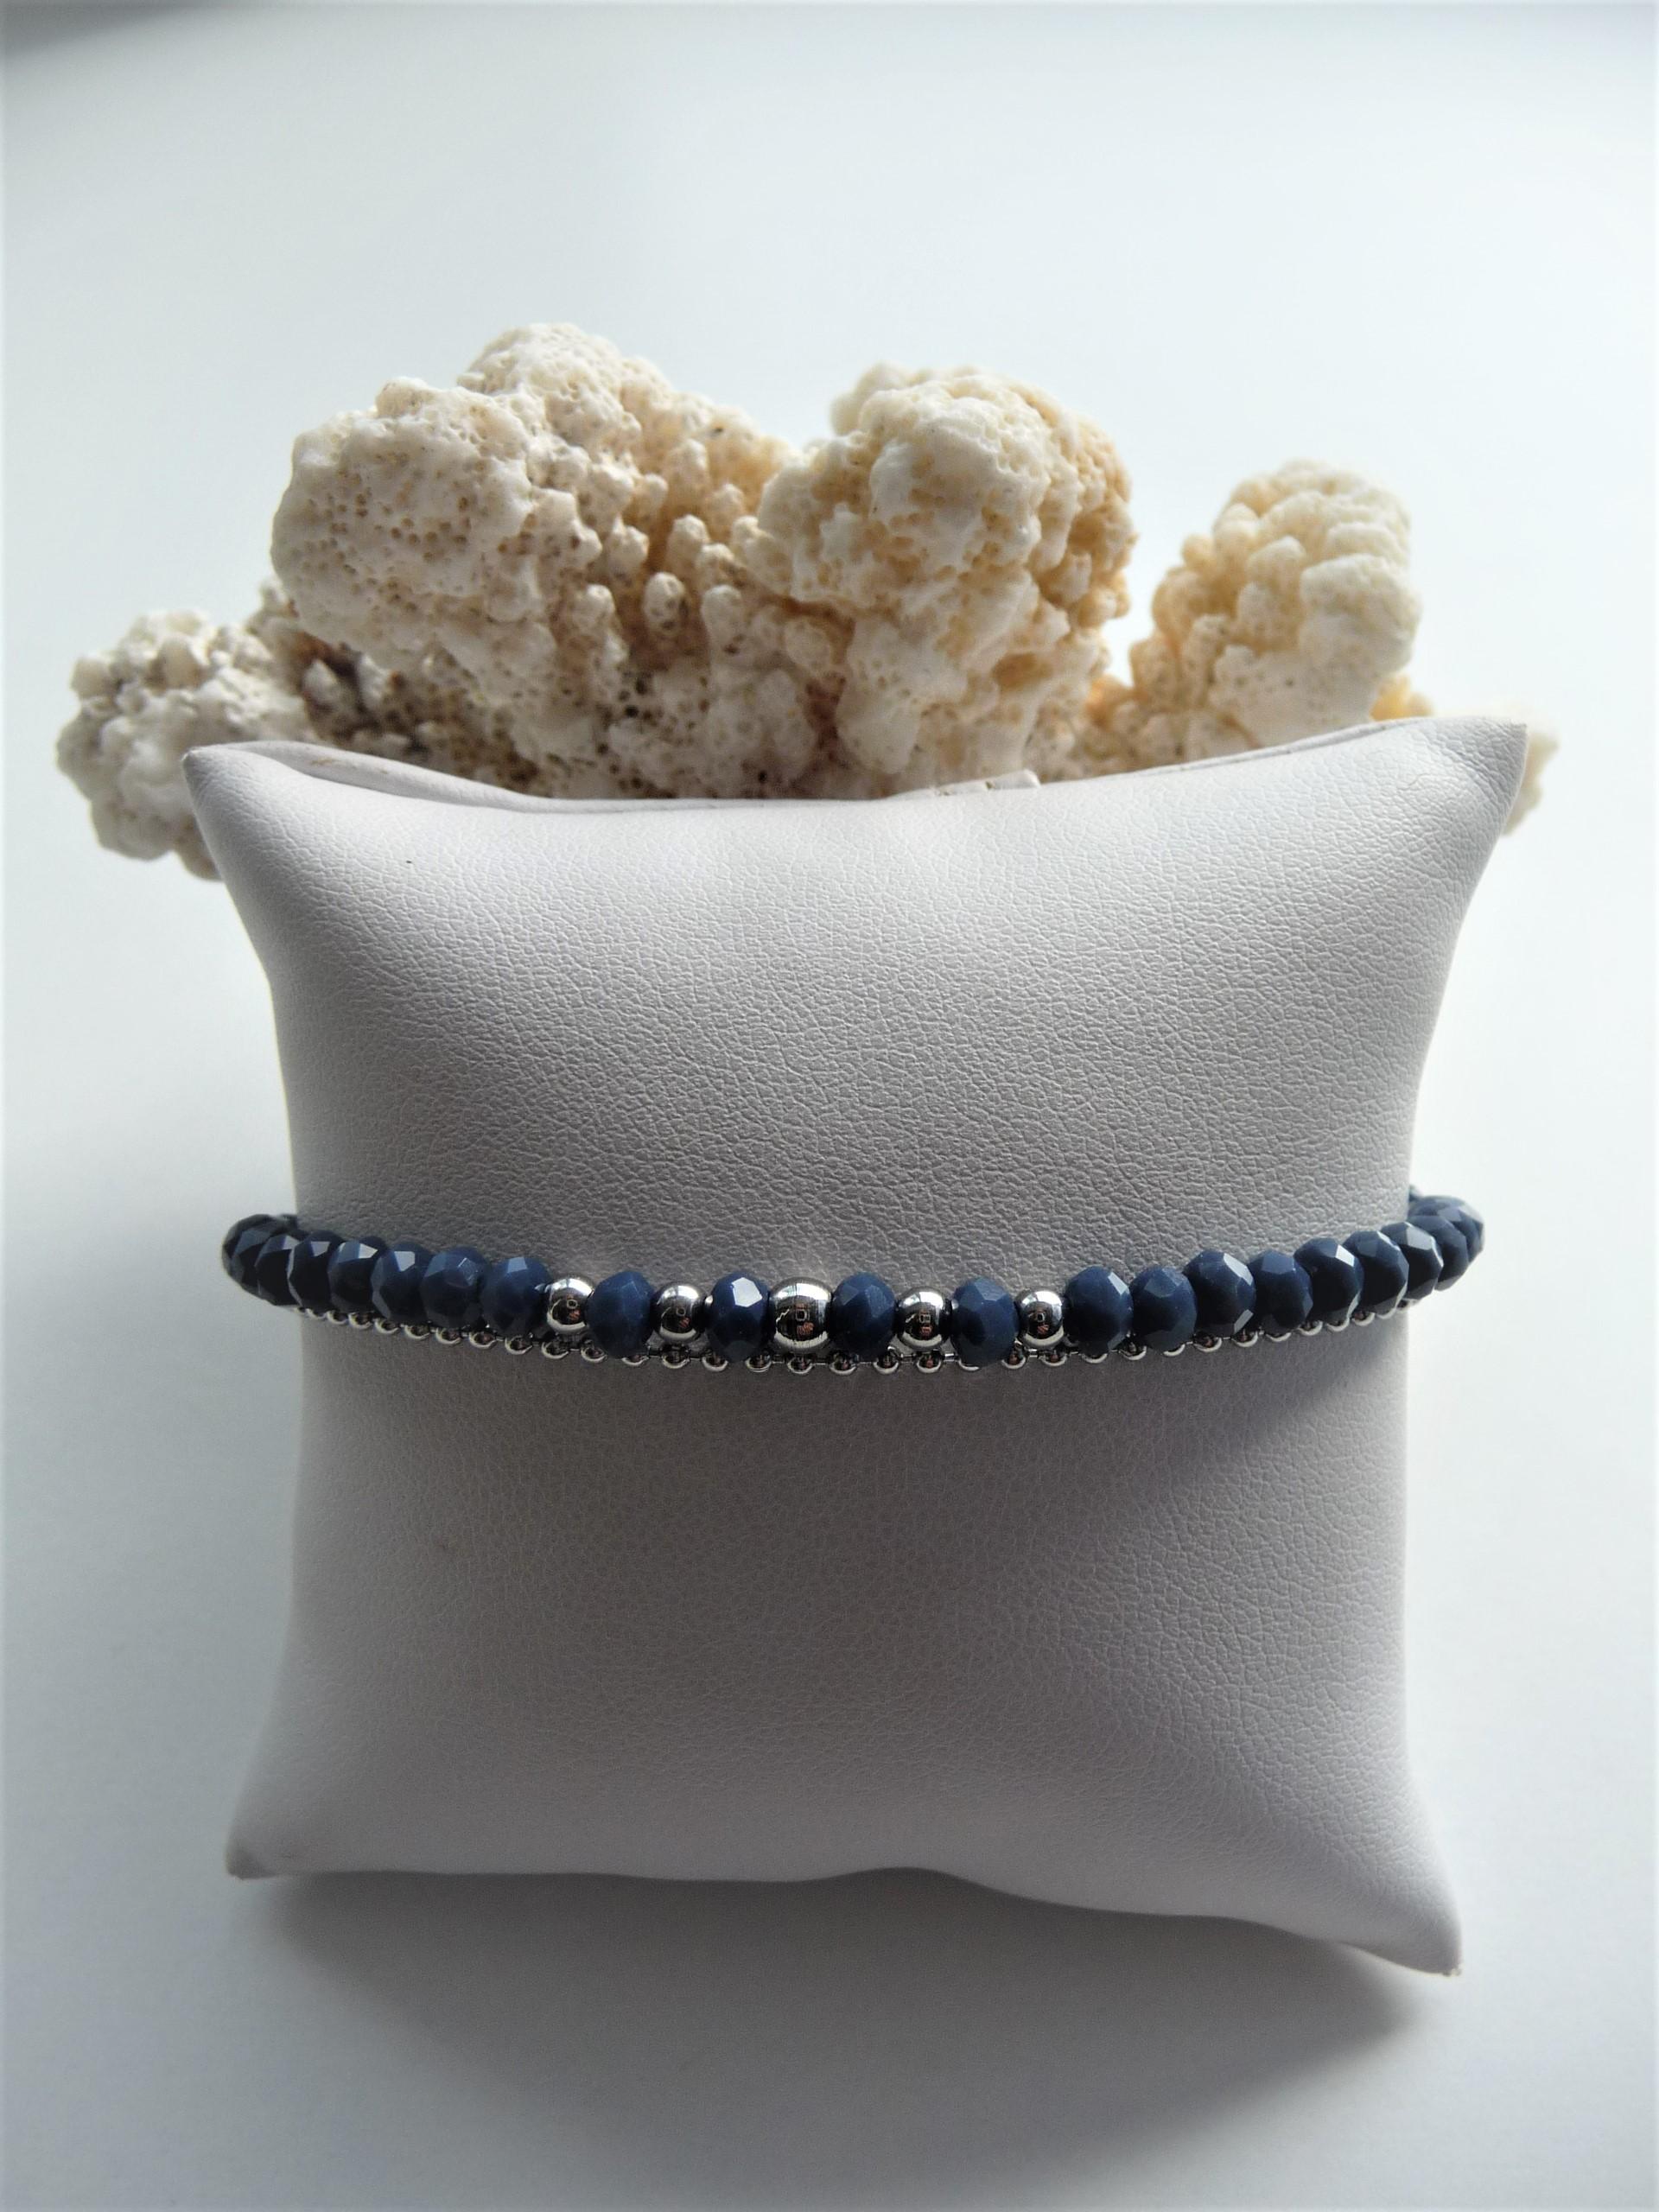 Perles en verre bleu pétrol, perles et chaine acier inox